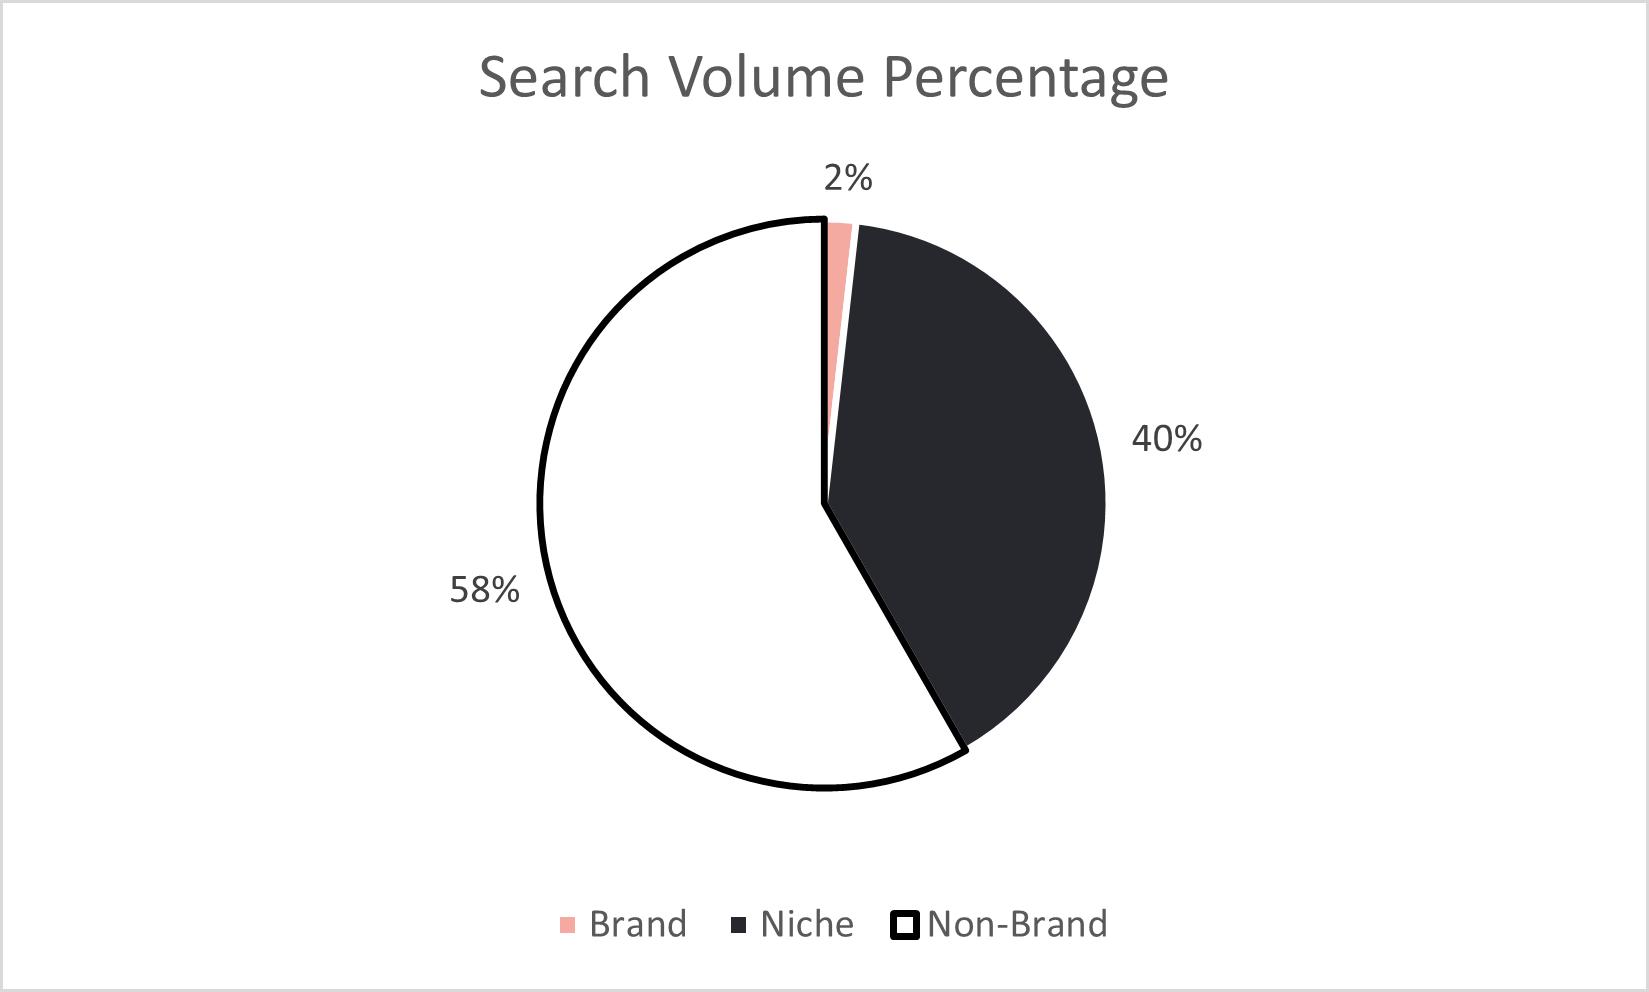 Search volume percentage